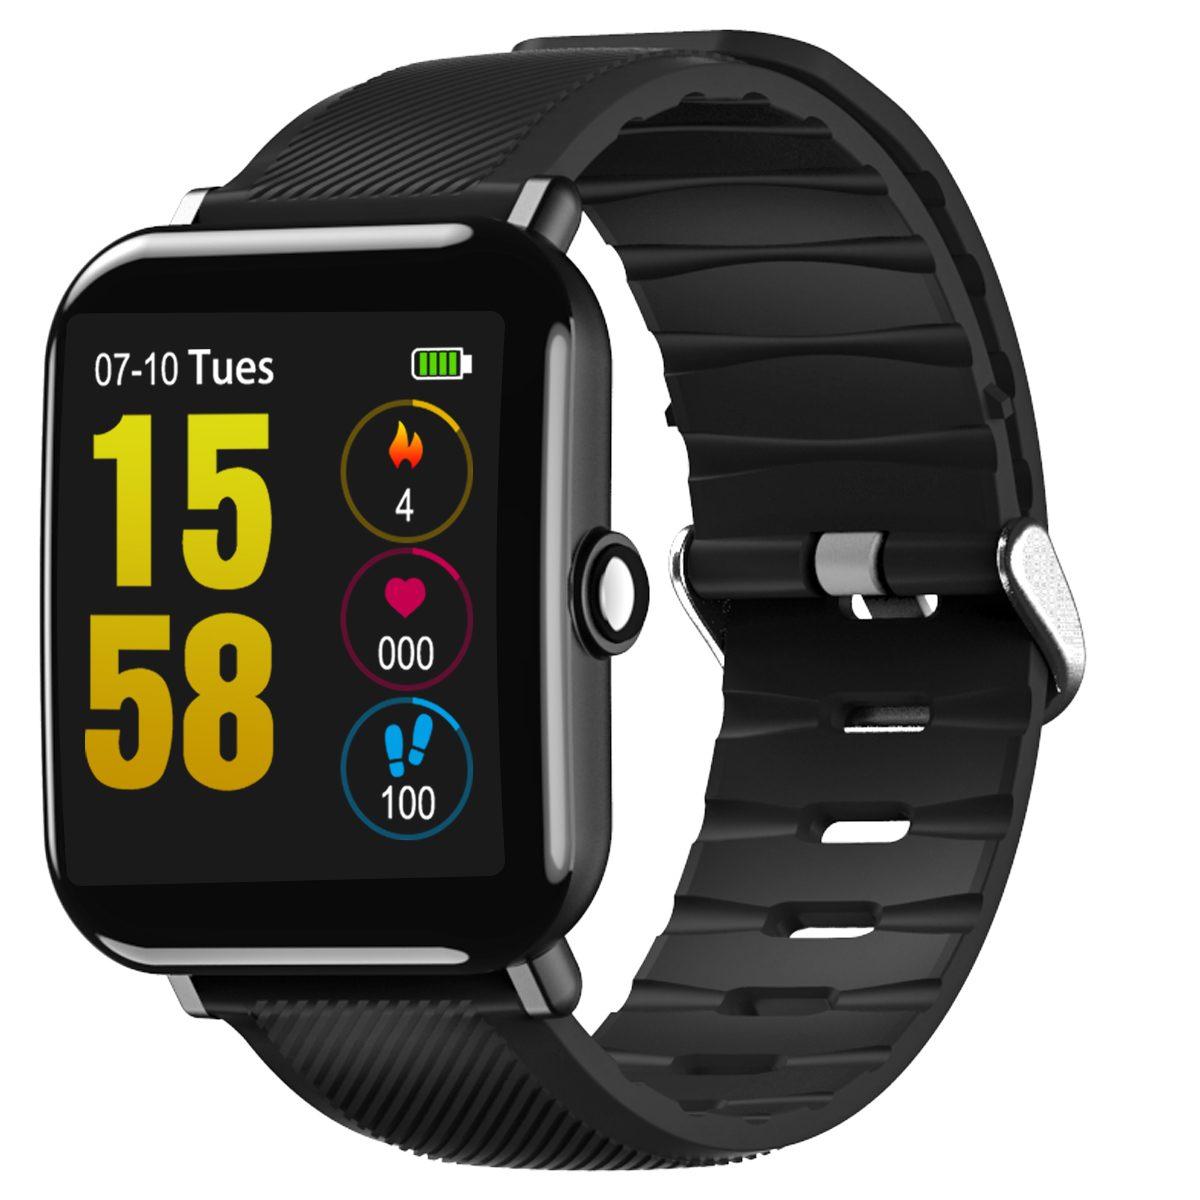 OUKITEL W2 1.3' 2.5D Large Screen Heart Rate Sleep Monitor Smart Watch Sports Mode Message Display 15Days Standby Smart Watch